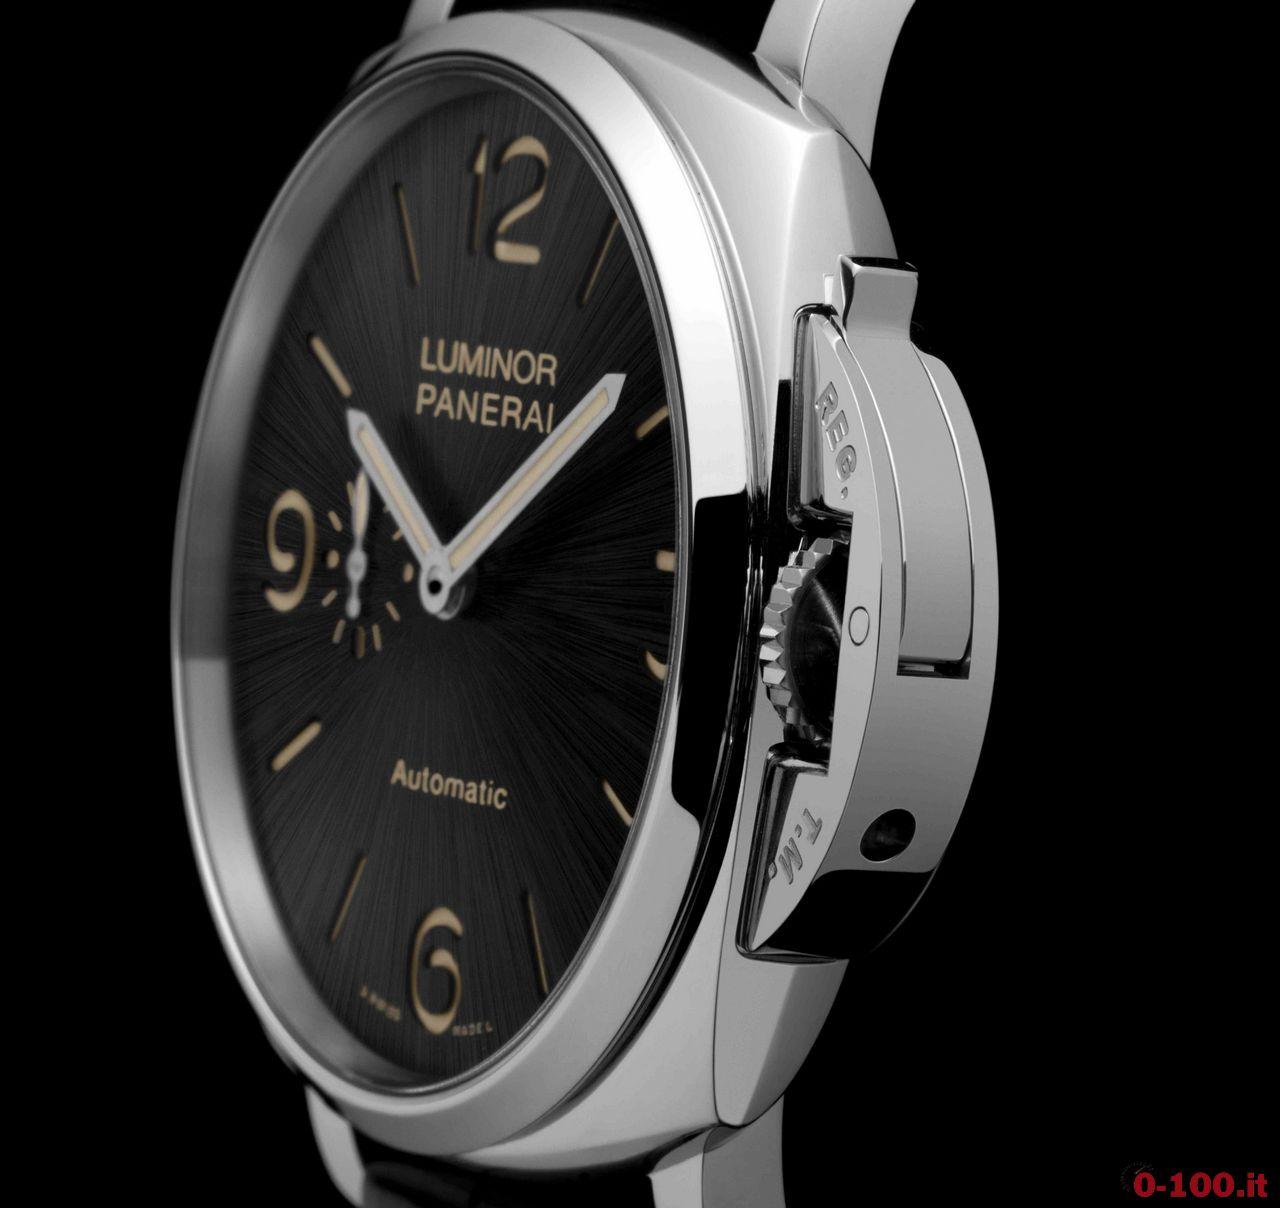 officine-panerai-luminor-due-3-days-automatic-pam00674-prezzo-price_0-1002